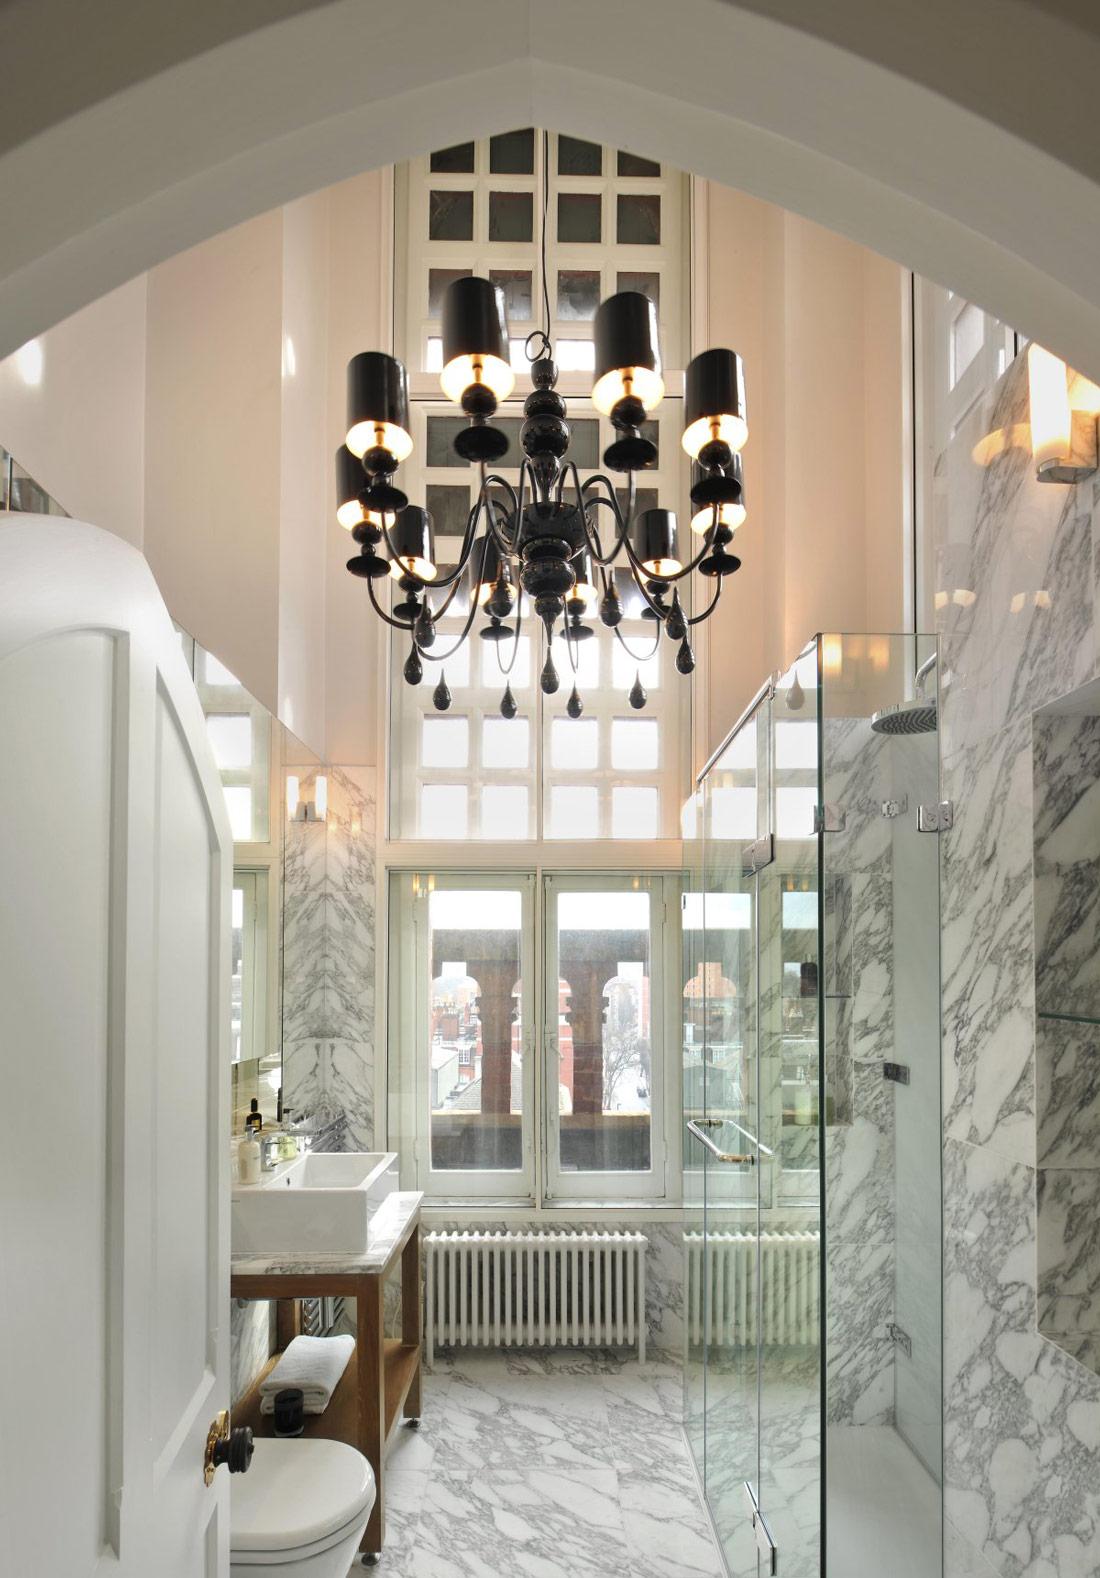 Marble Bathroom, Chandelier, St Pancras Penthouse Apartment in London